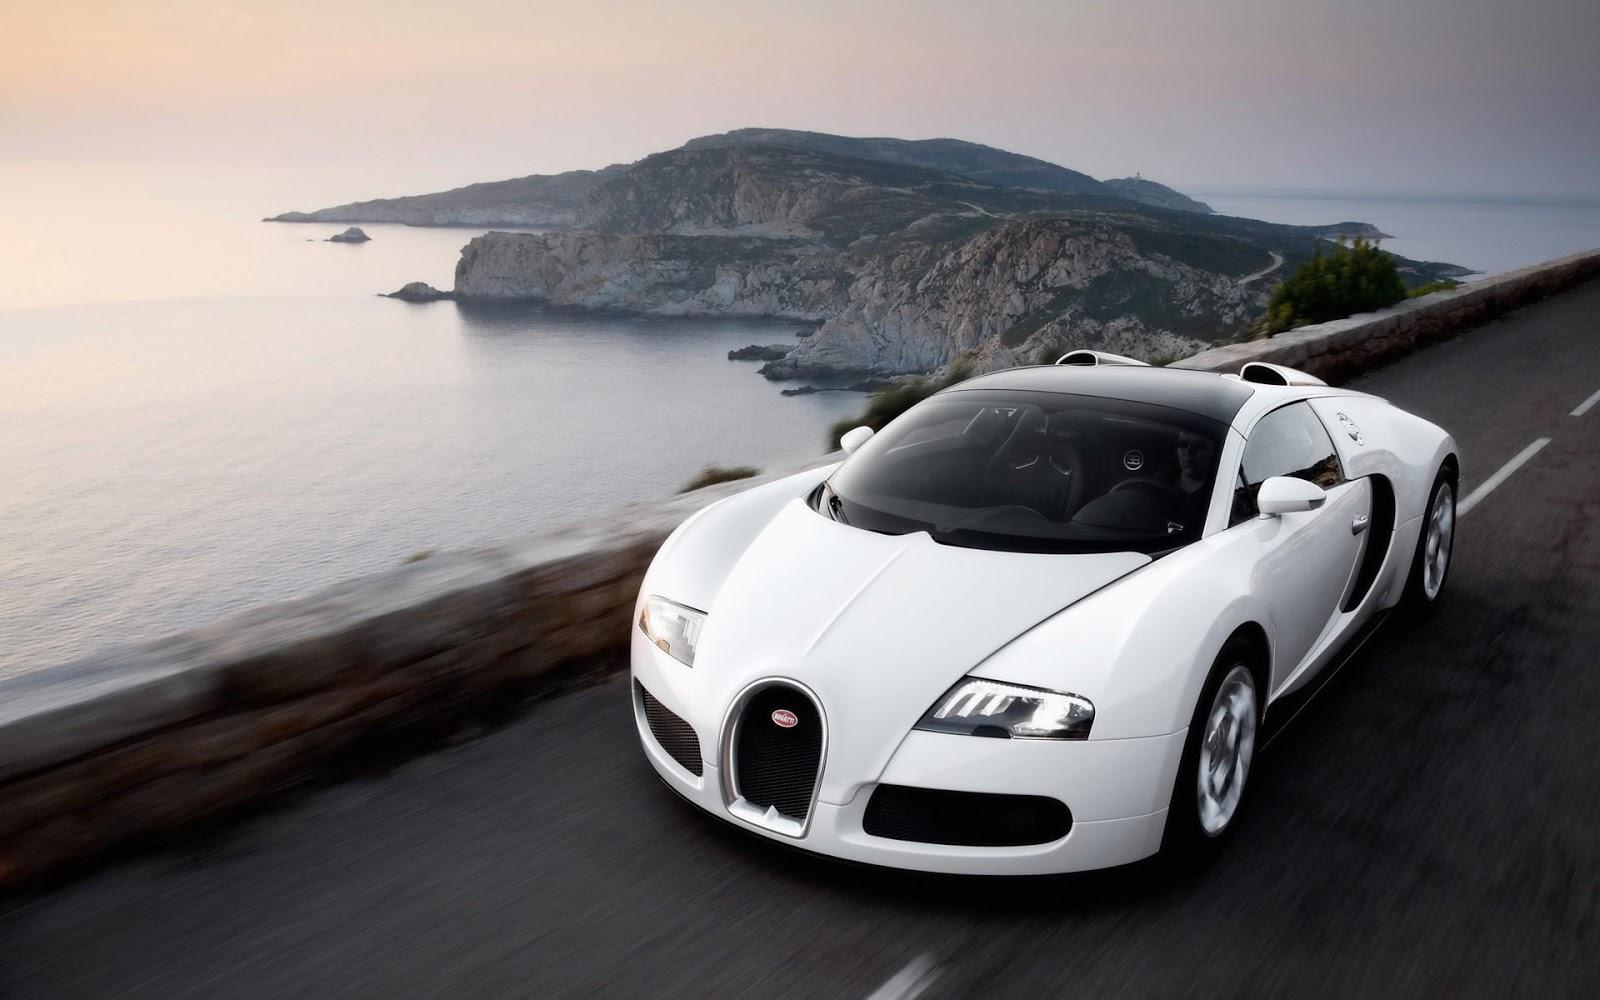 bugatti veyron super sport 2013 cars wallpapers hd - Super Cool Cars Wallpapers Hd